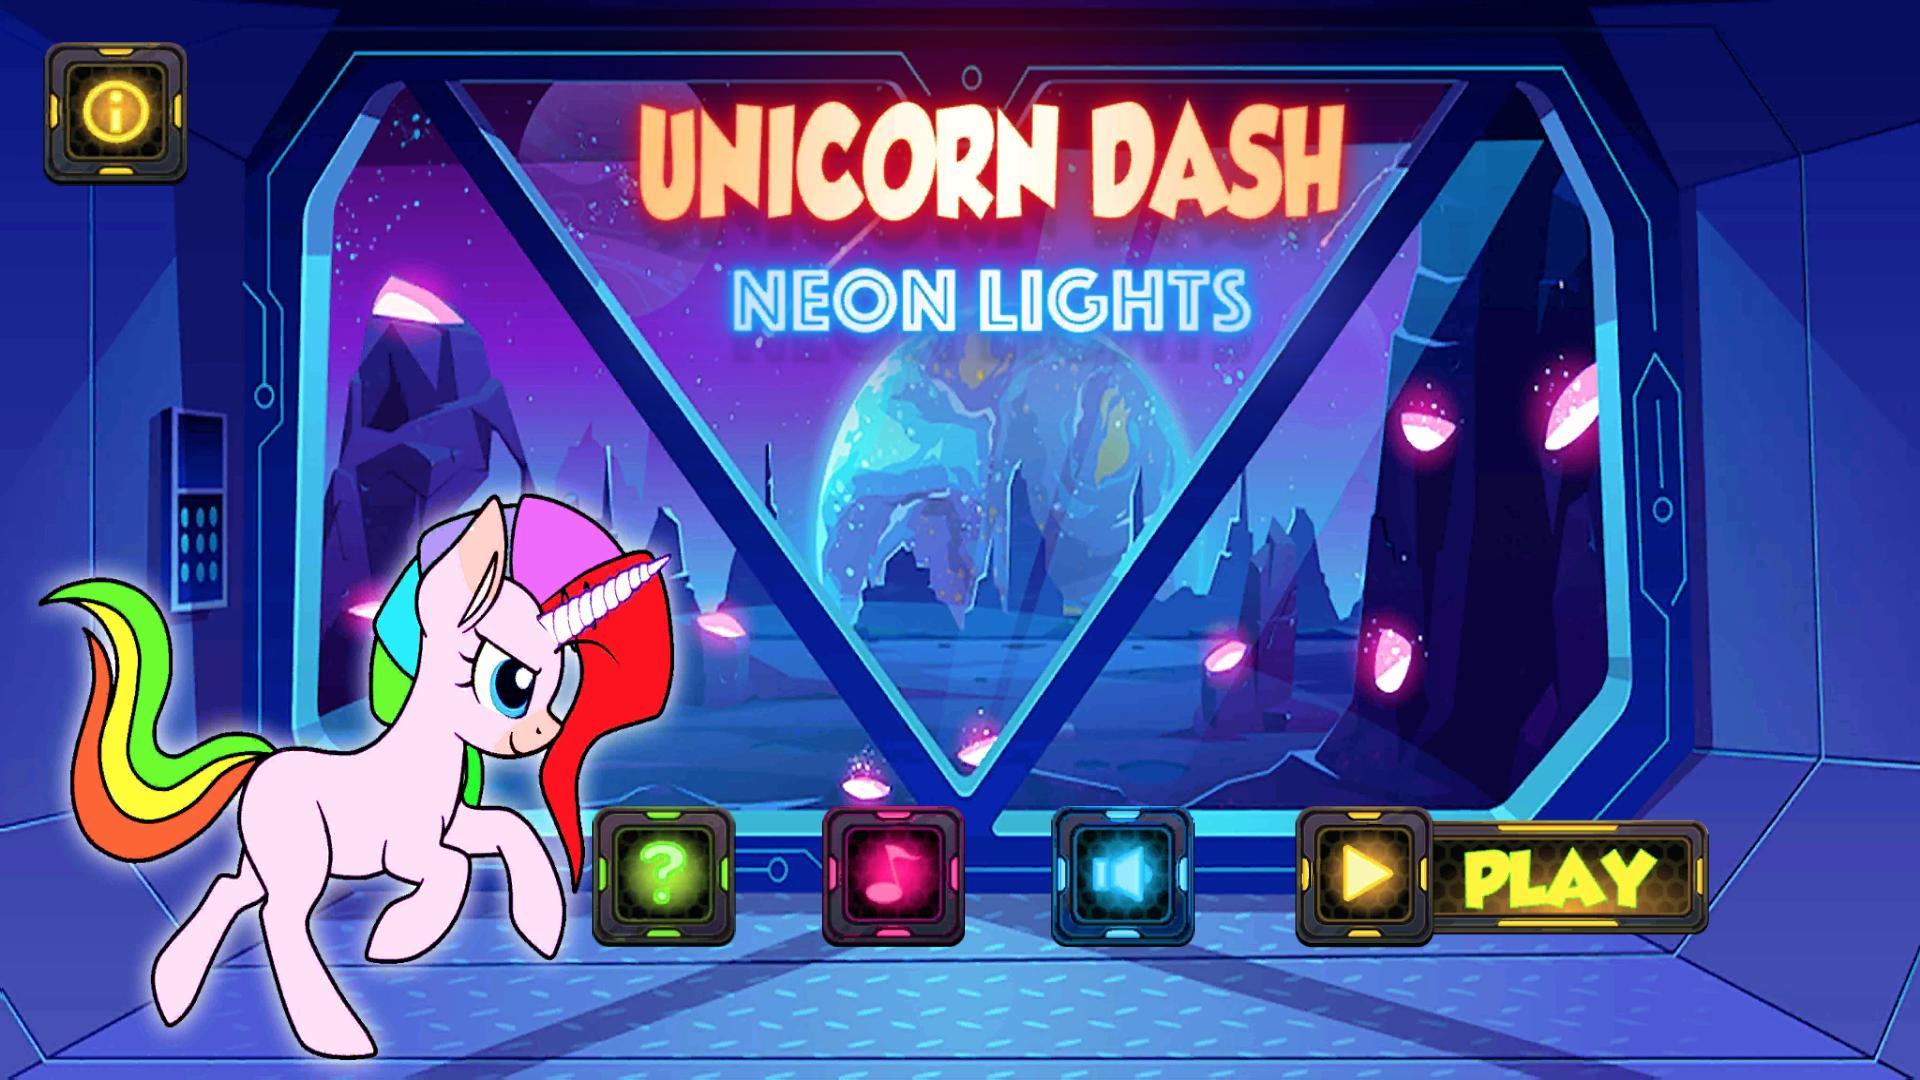 Unicorn Dash Neon Lights Unicorn Games mlp games 2.8.105 Screenshot 23